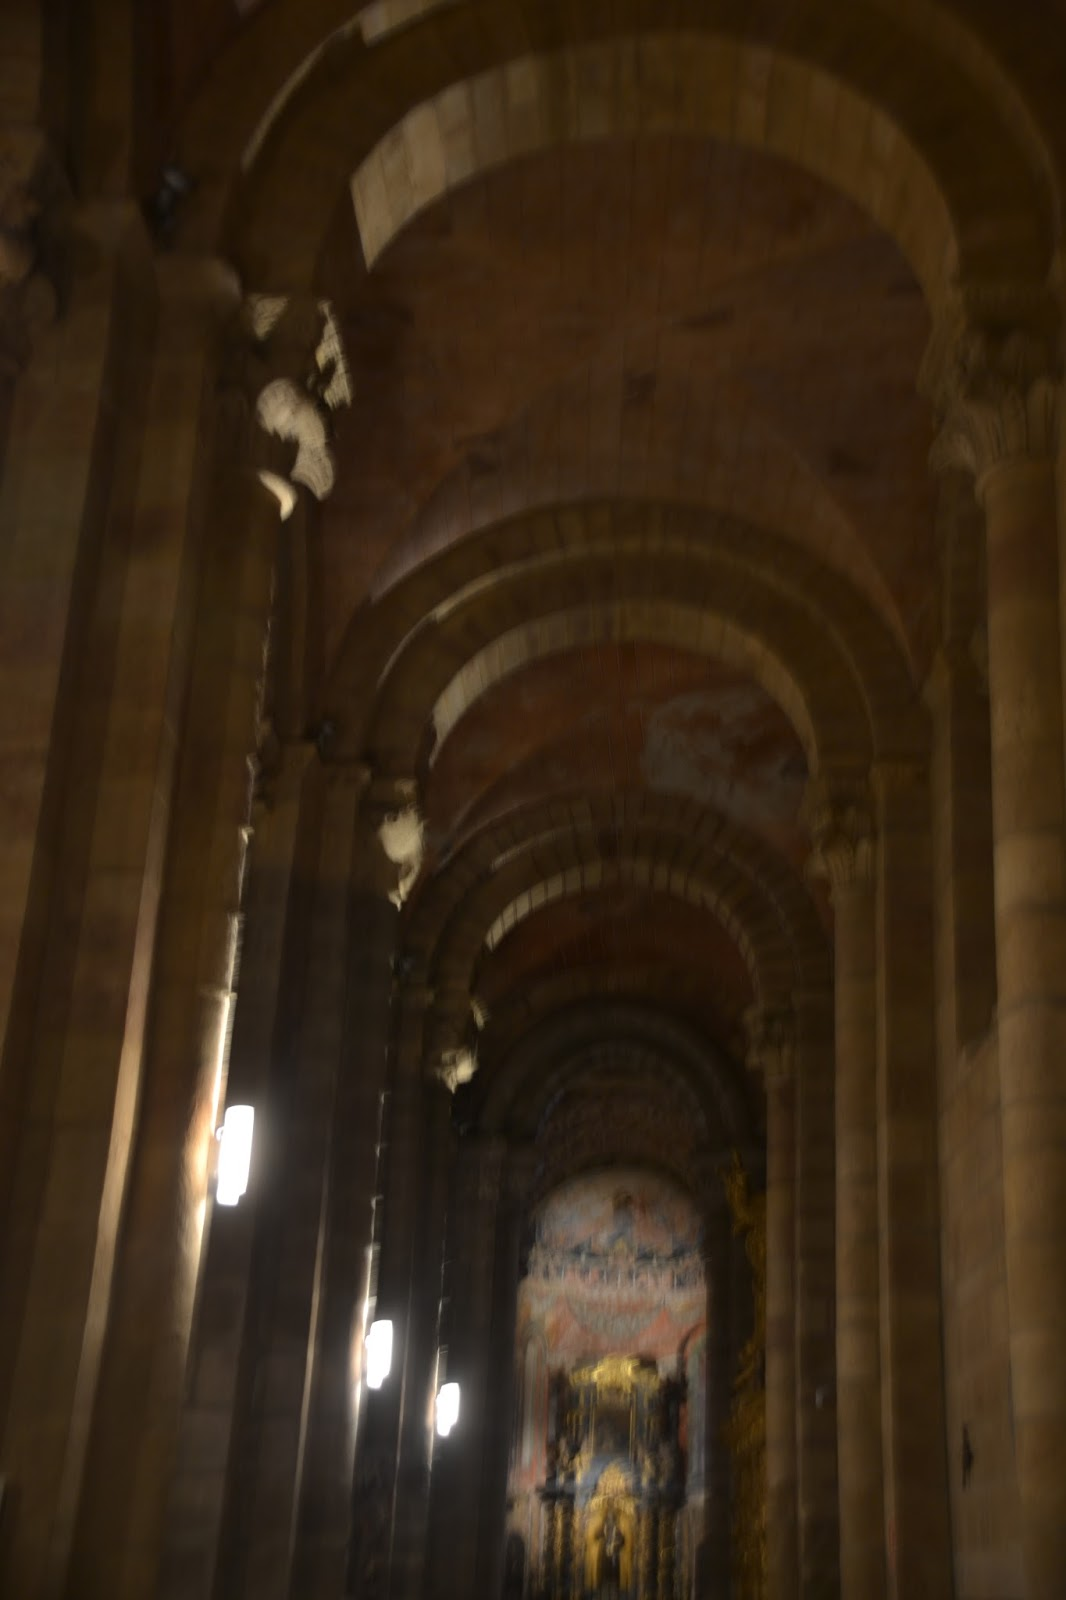 Antonio Tejedor Garc A 2012 # Muebles Mezquita Alcanices